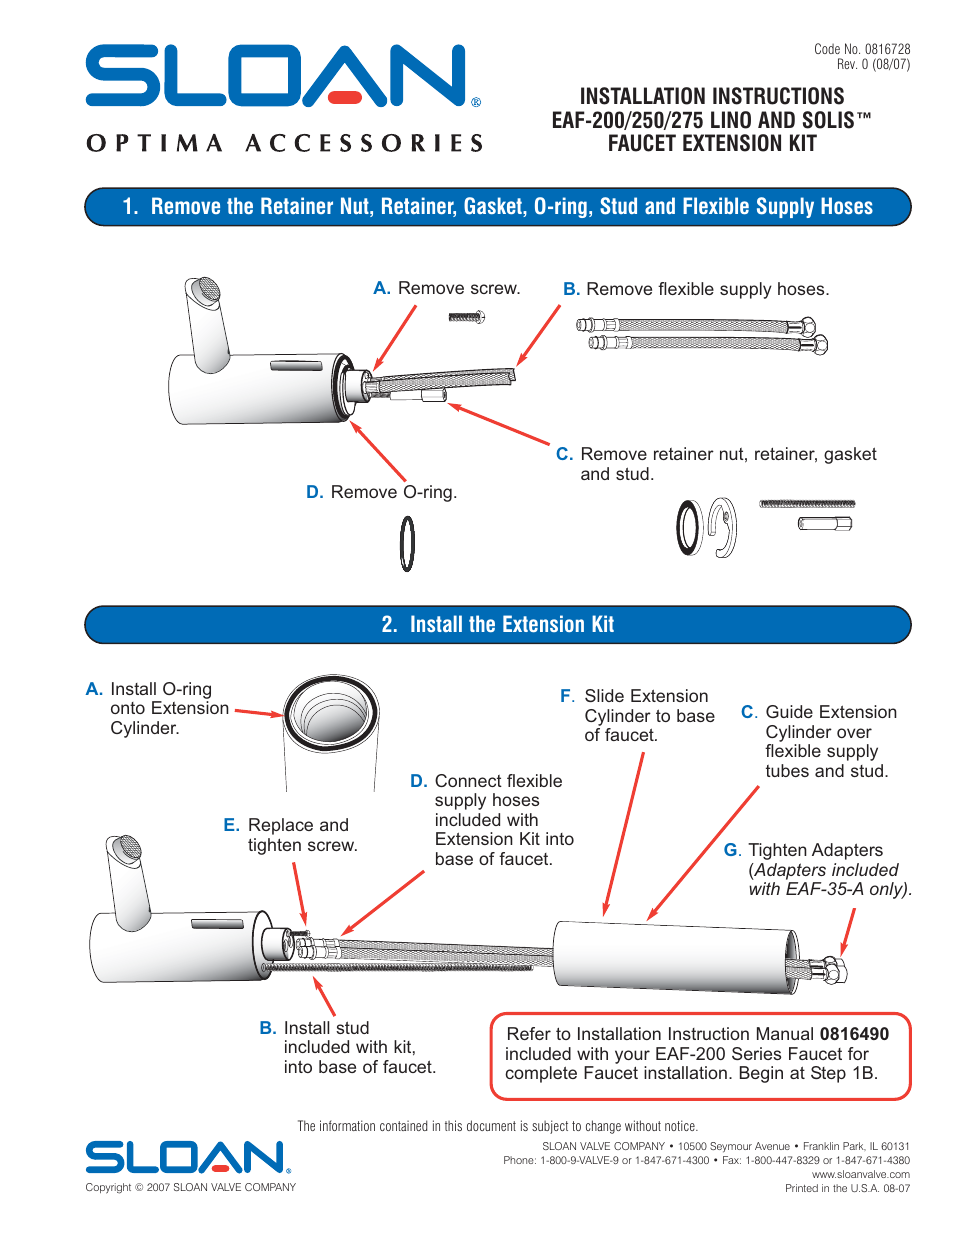 Sloan EAF-200 Series Extension Kit User Manual | 1 page